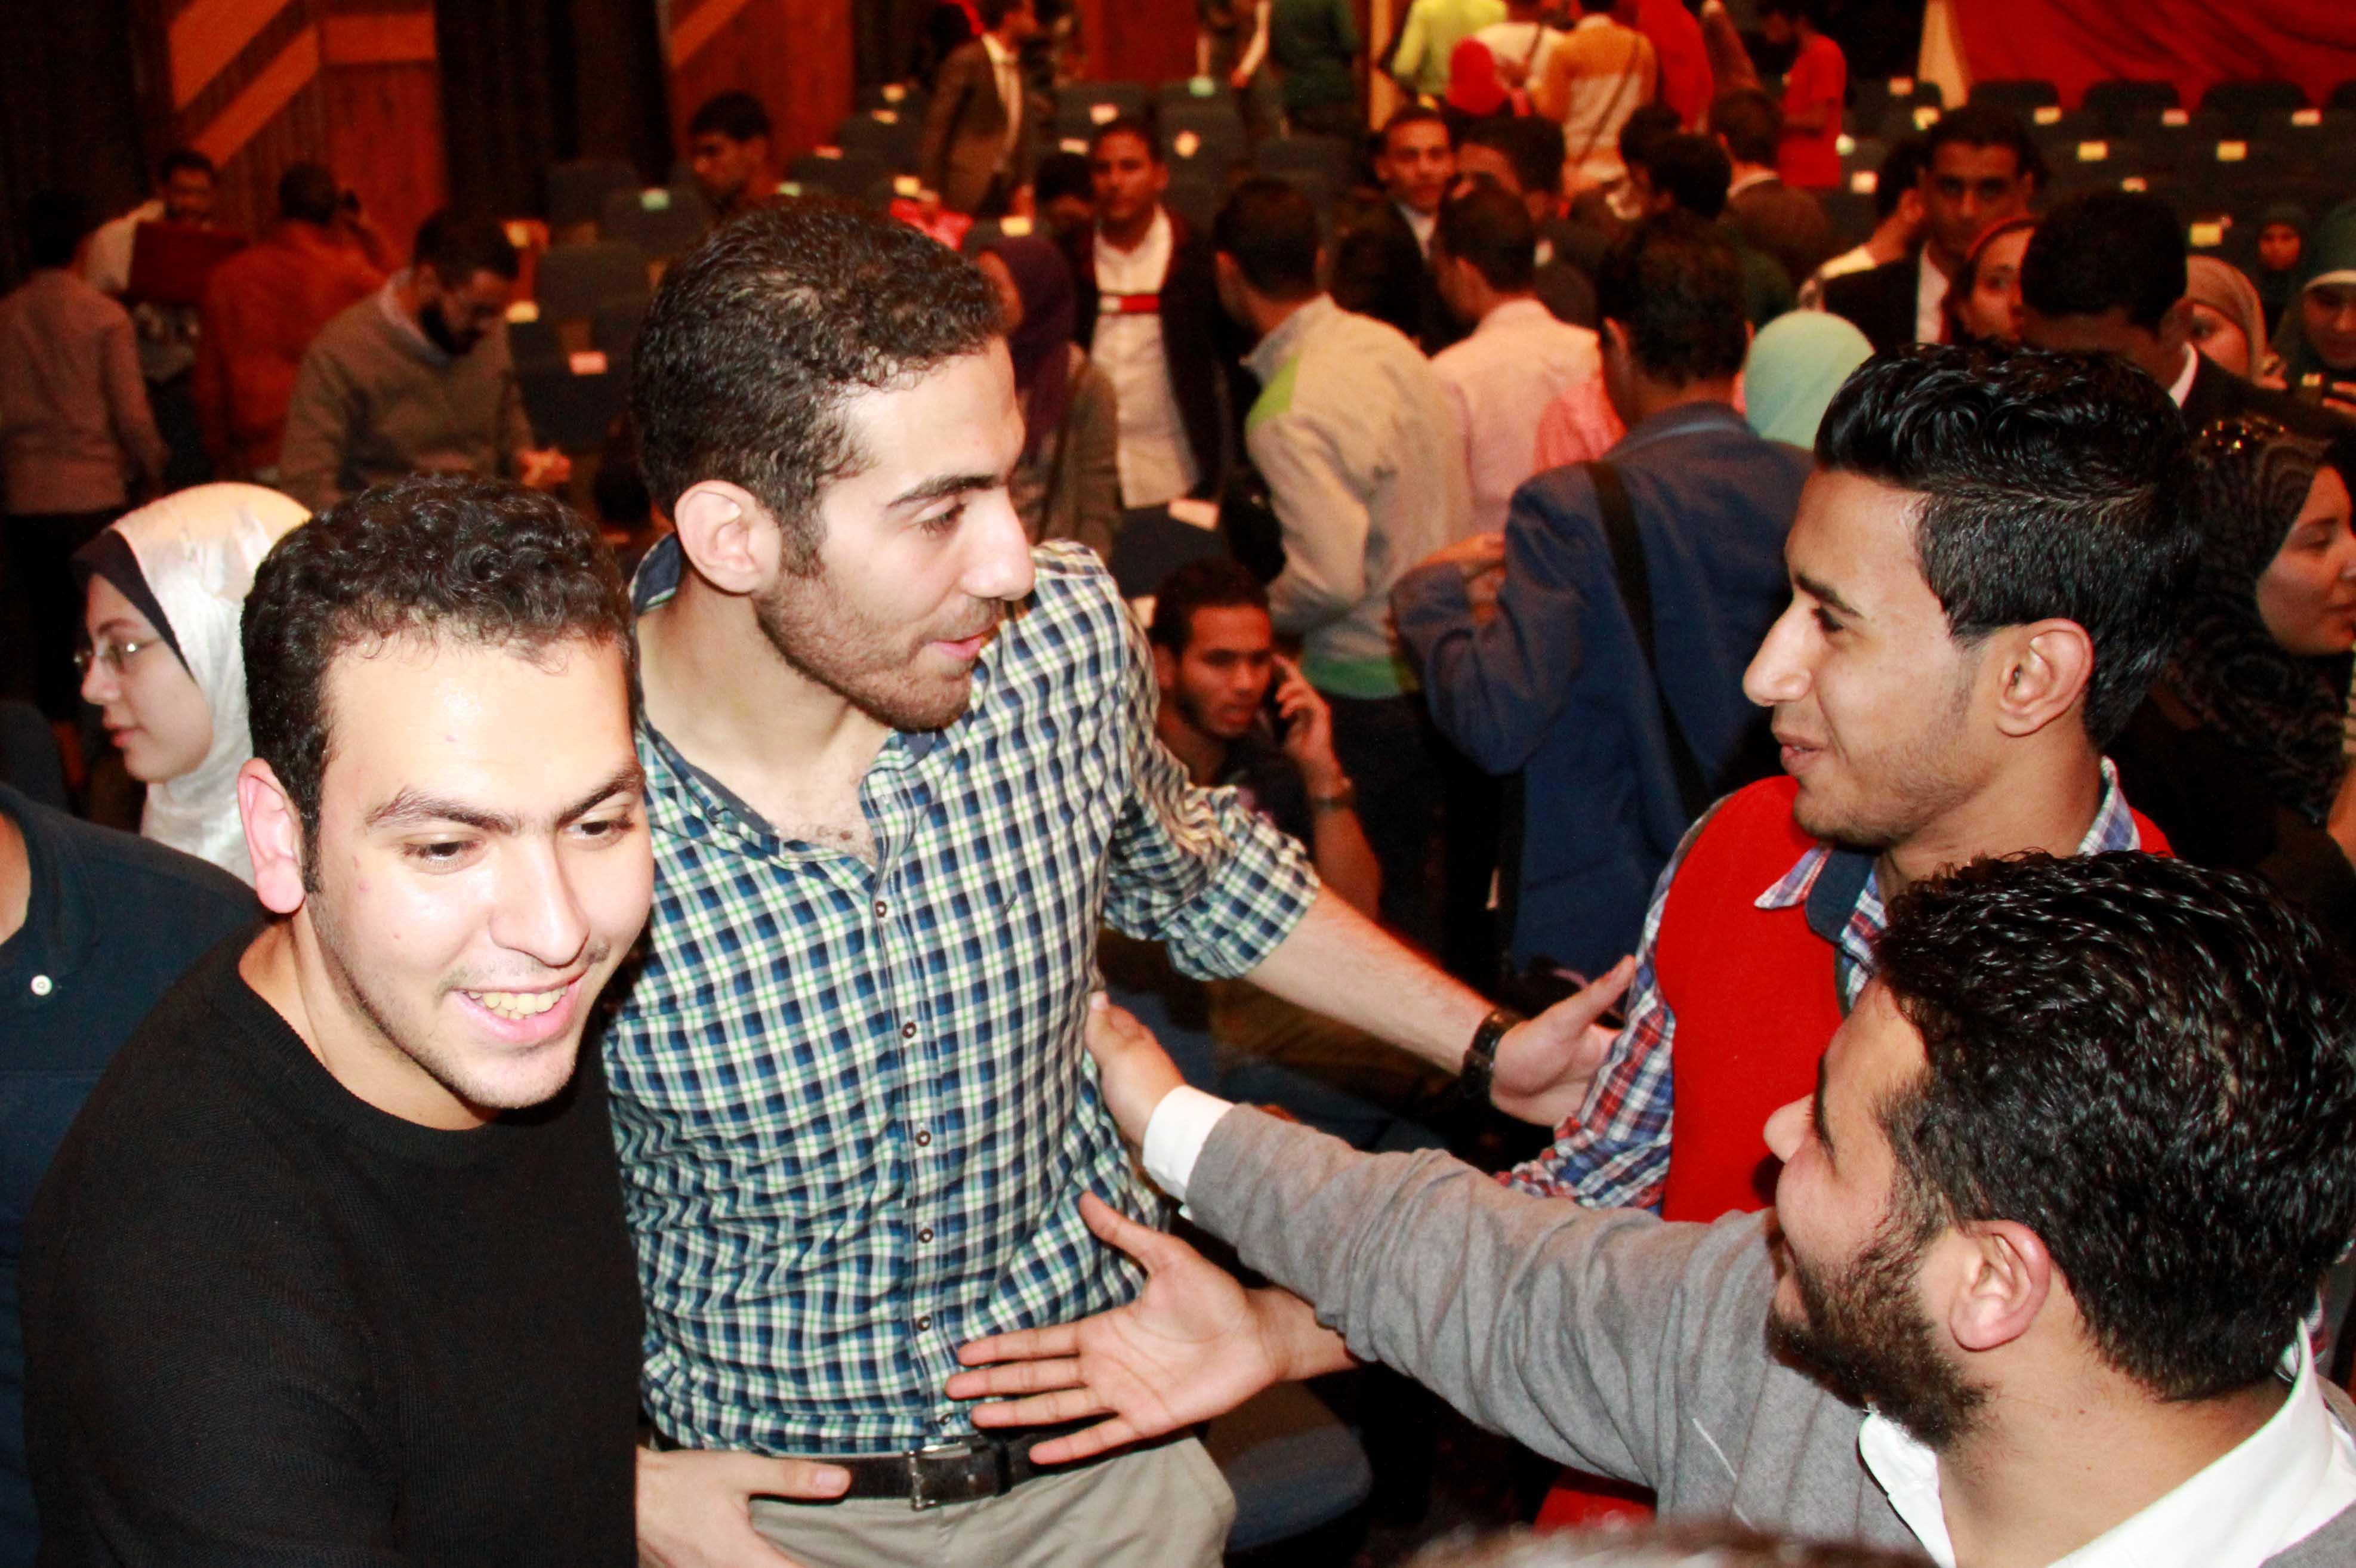 Cairo University Student Union elections, Nov. 22. Photo by Mousa el-Zarif / Aswat Masriya